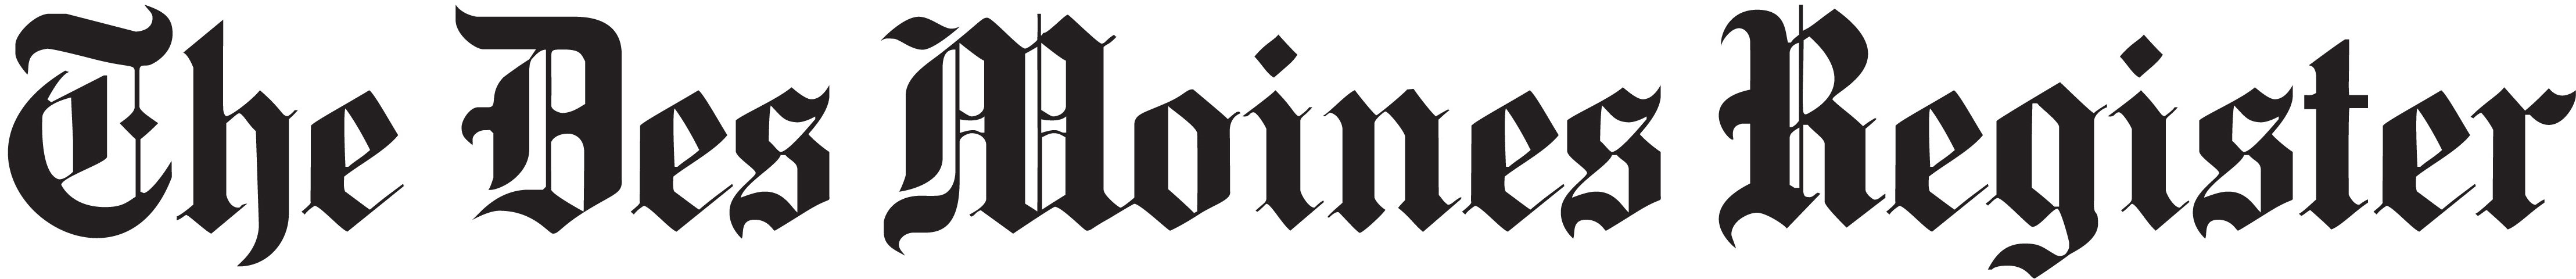 the-des-moines-register-logo